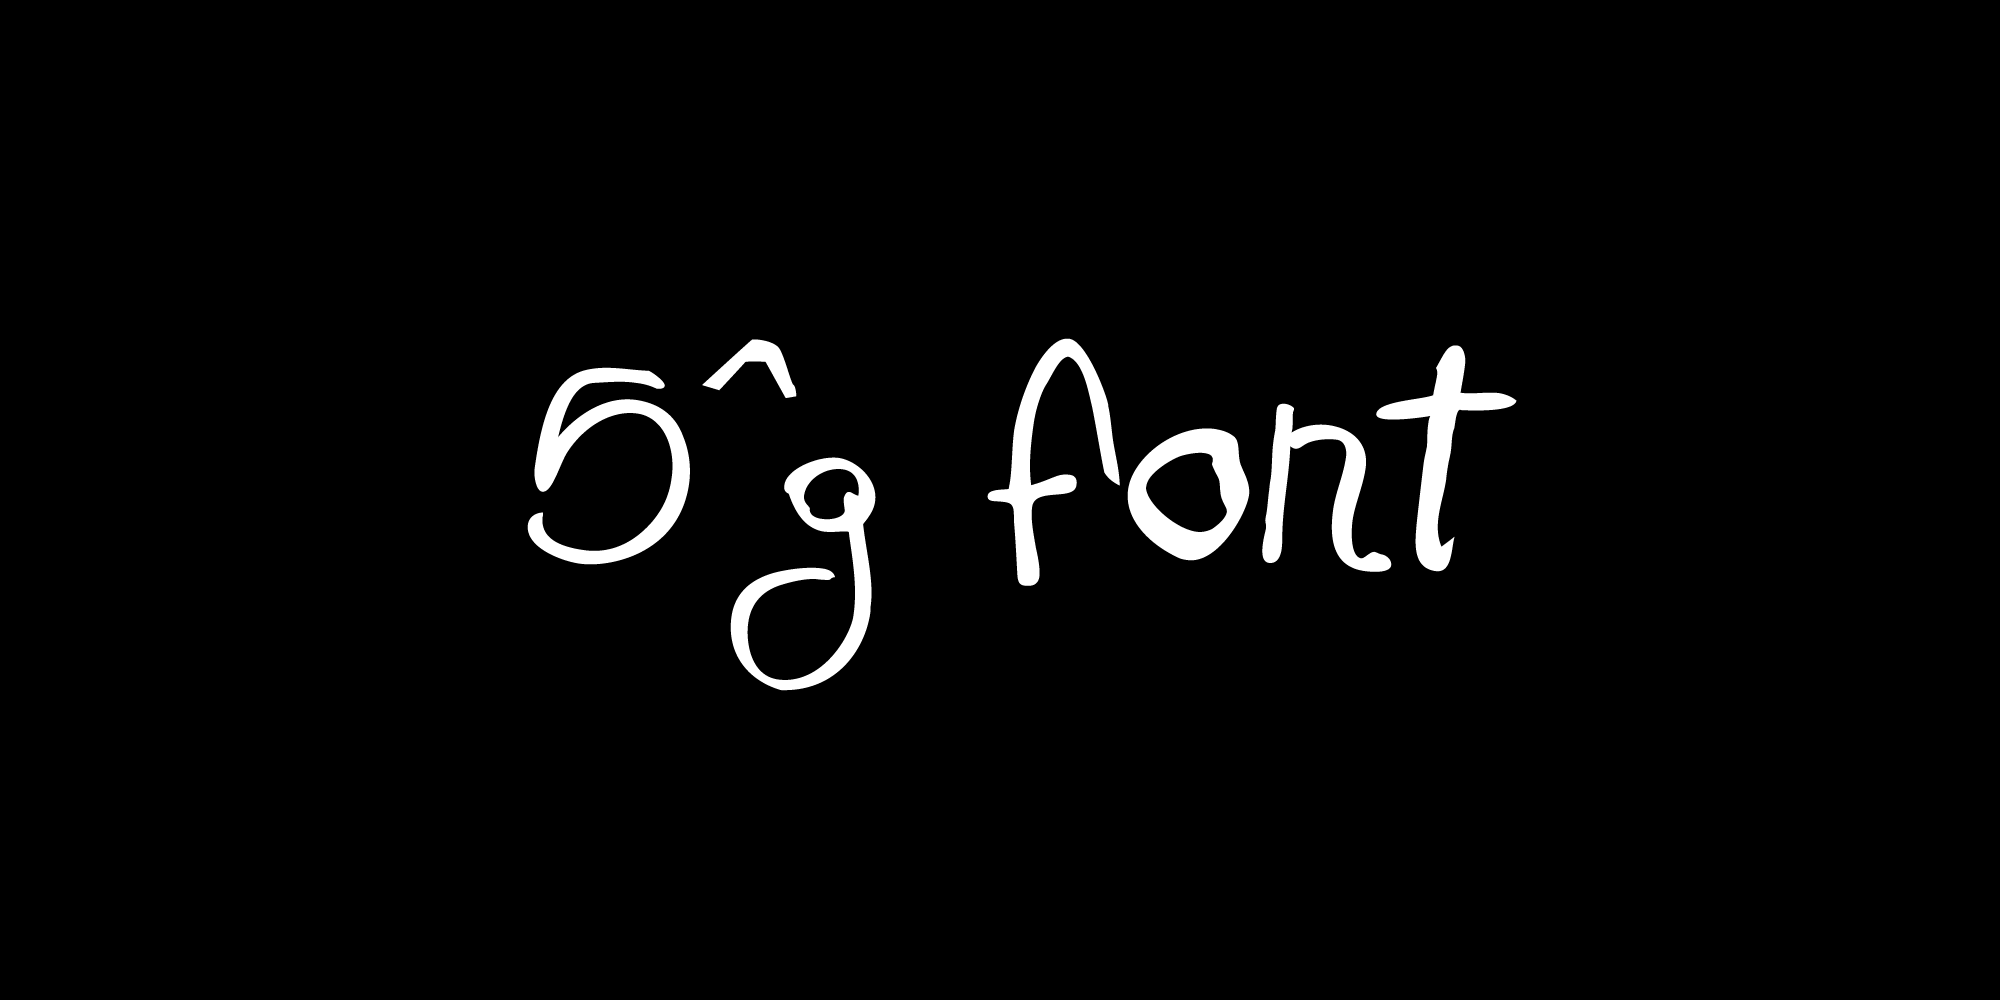 5^G font nameplate